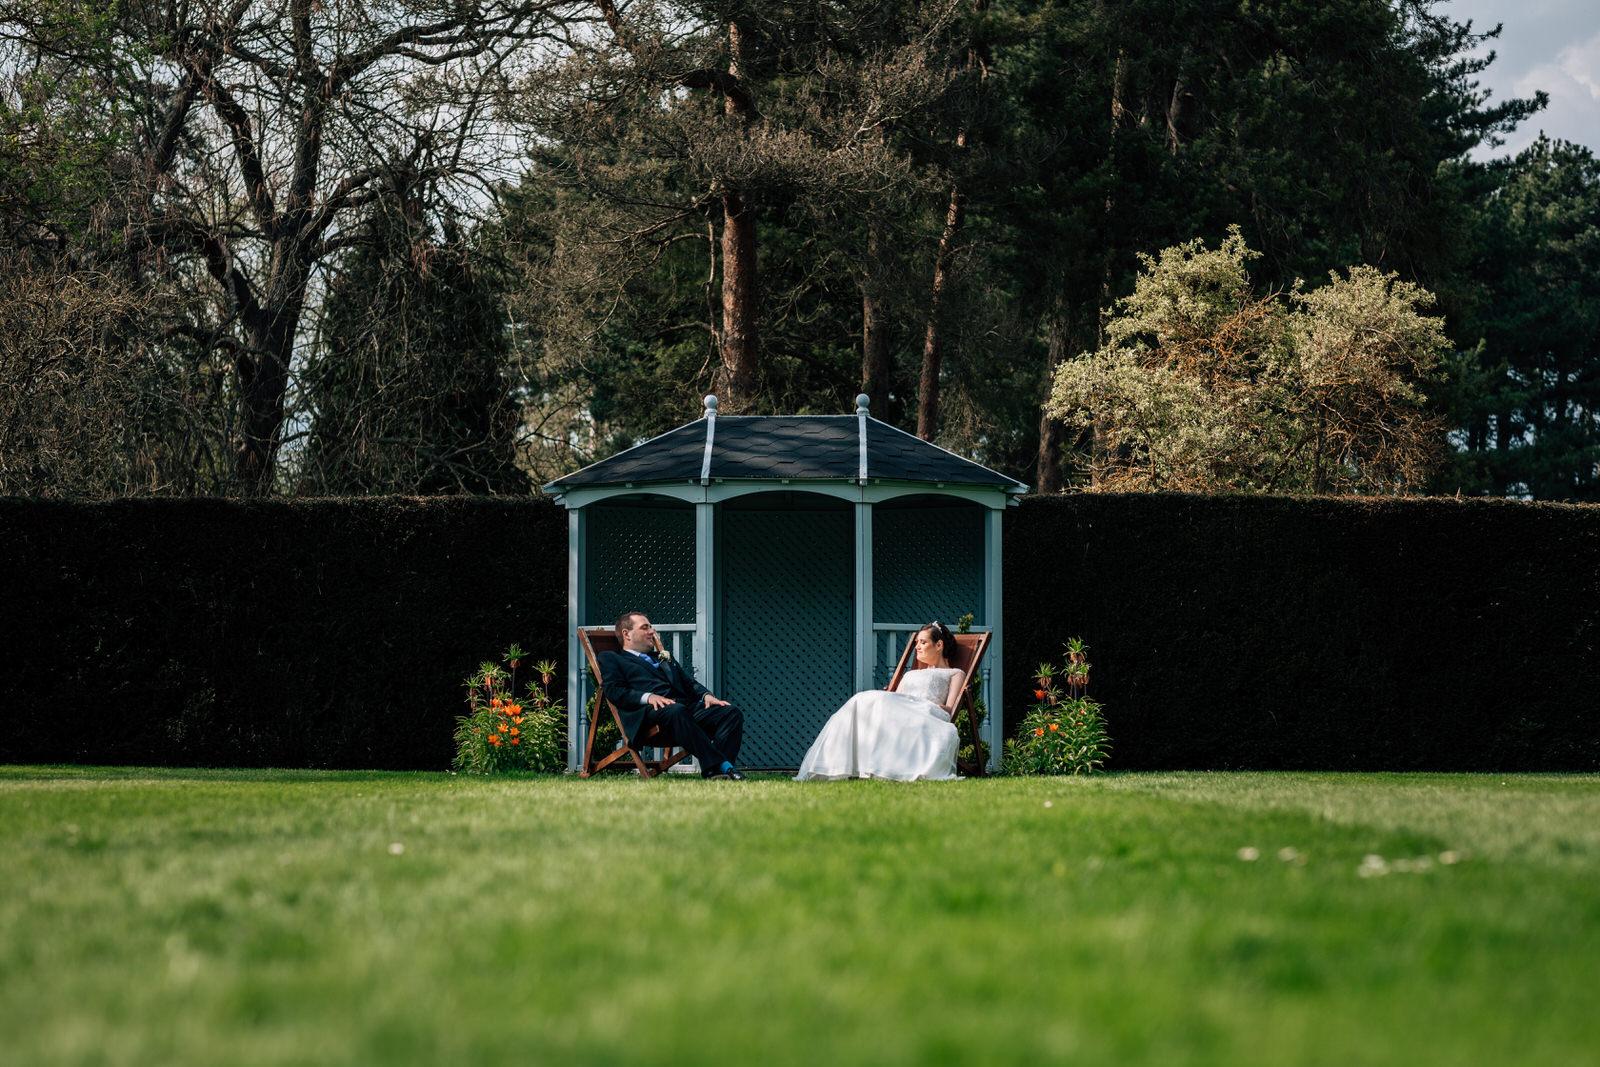 Home counties wedding photography by Damion Mower on English-Wedding.com (38)